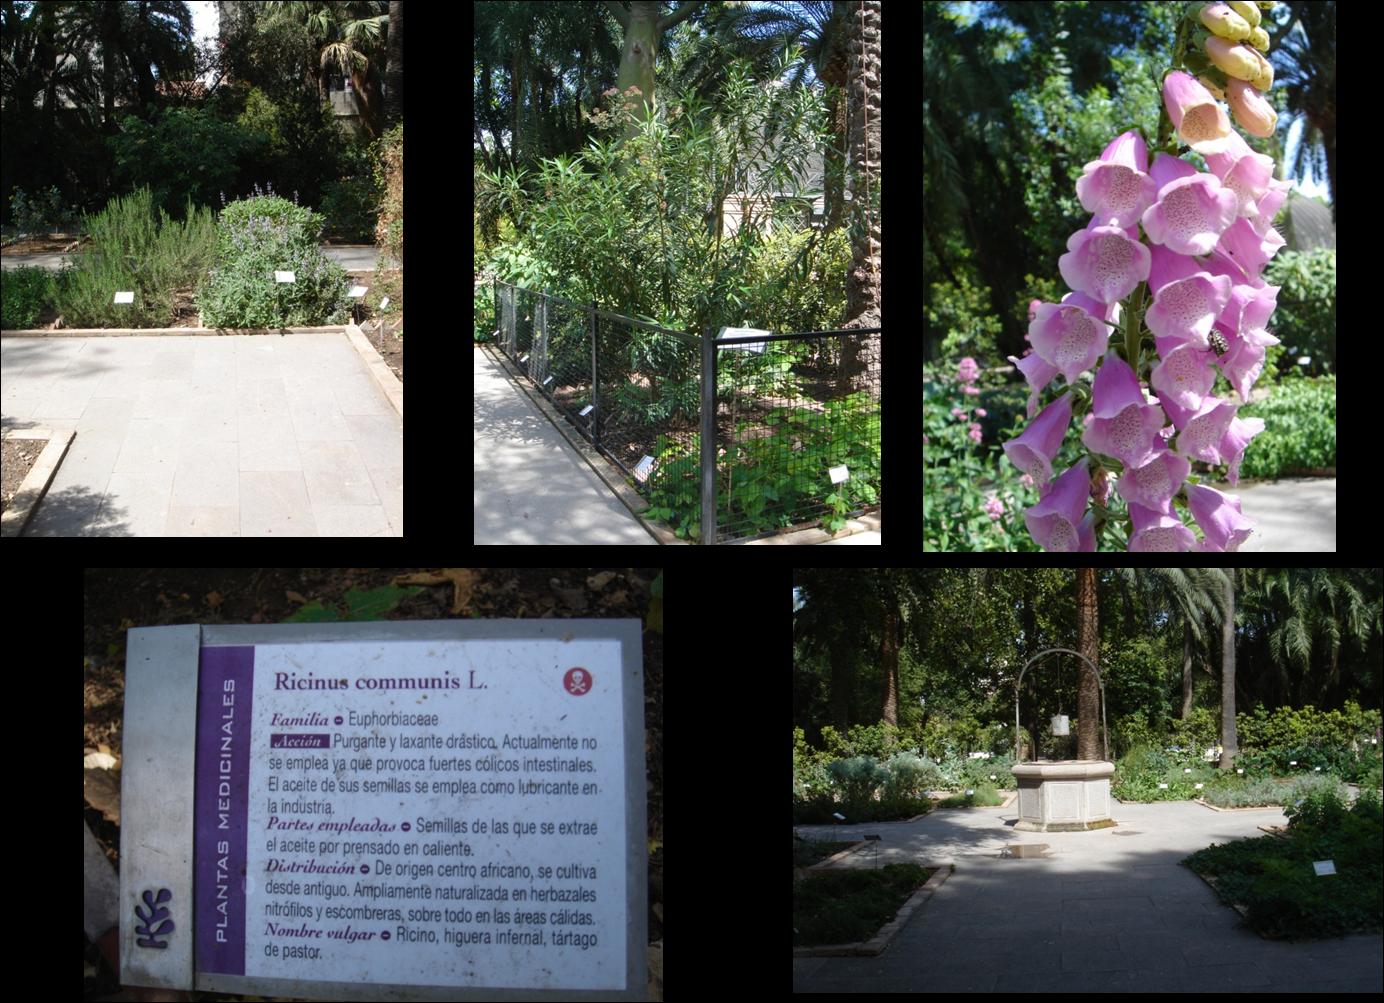 Territorio Naturaleza Jardin Botanico De Valencia Un Secreto Por Descubrir